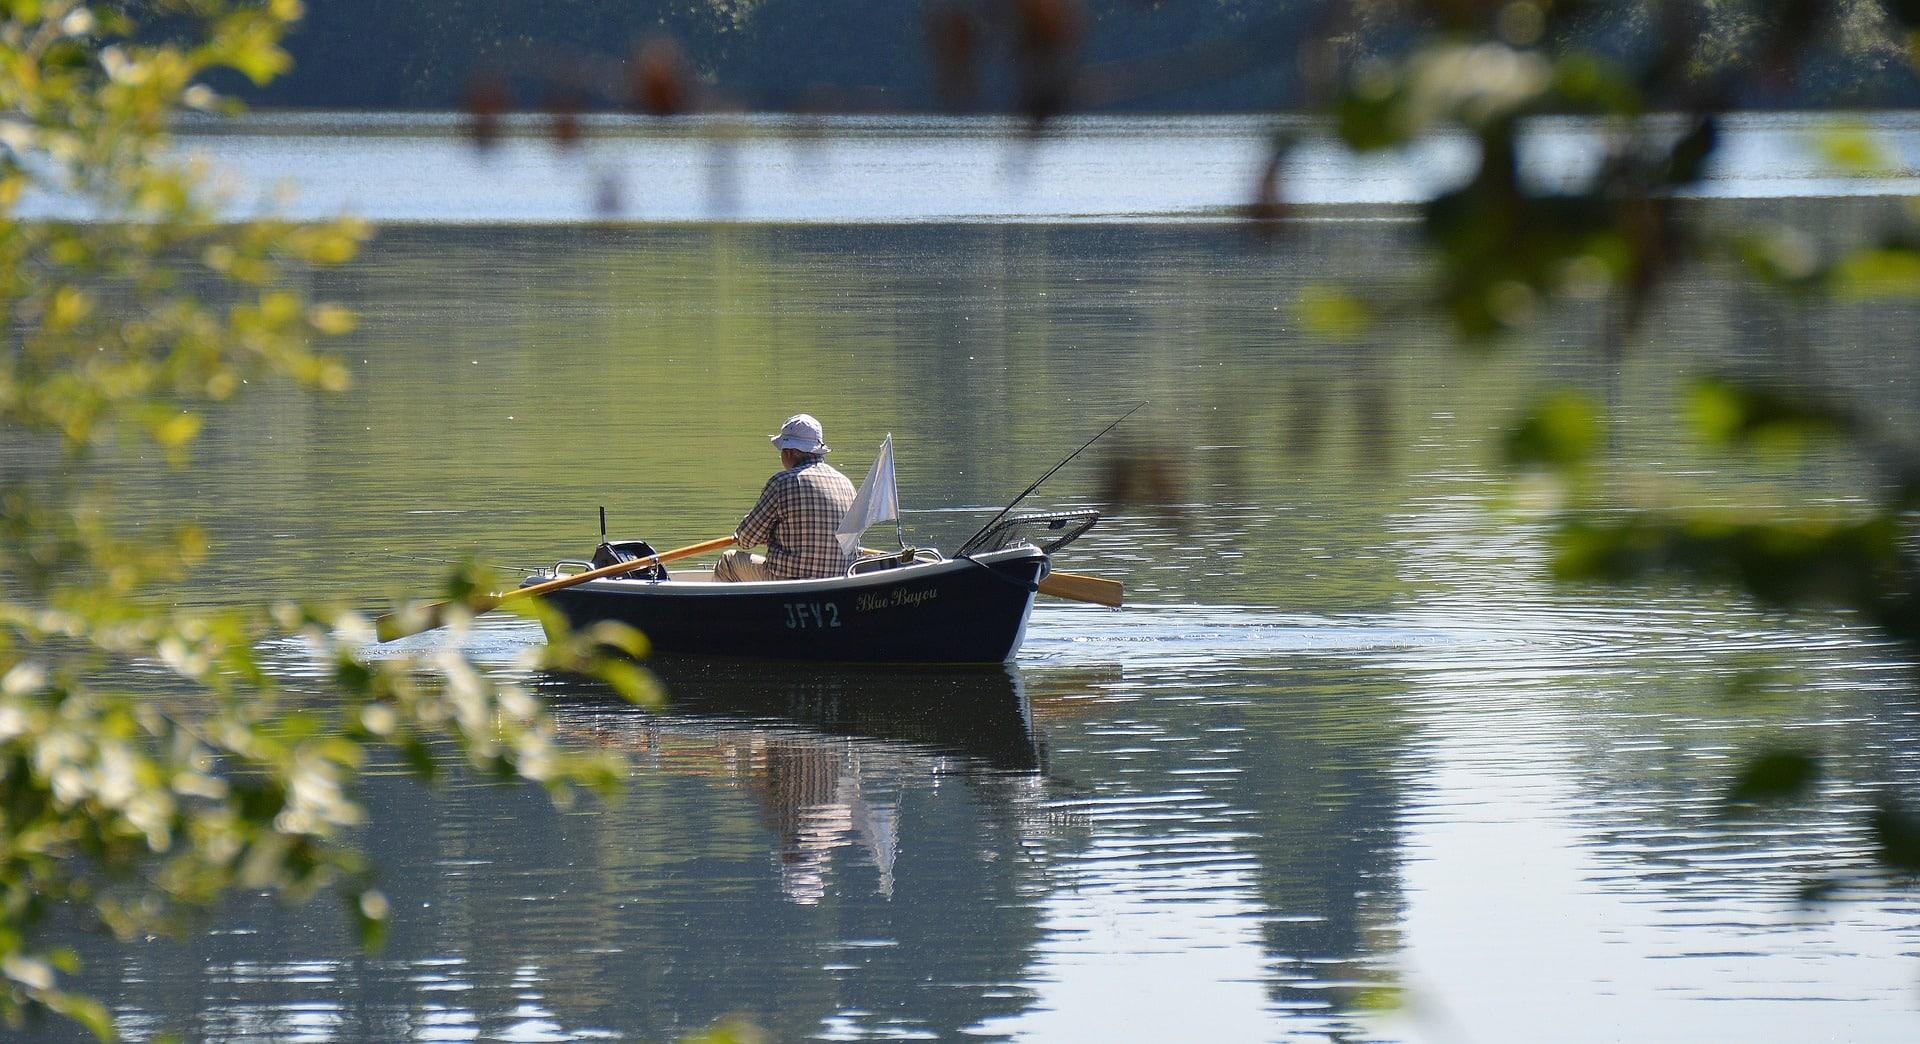 Angelschein Starnberg - Angler